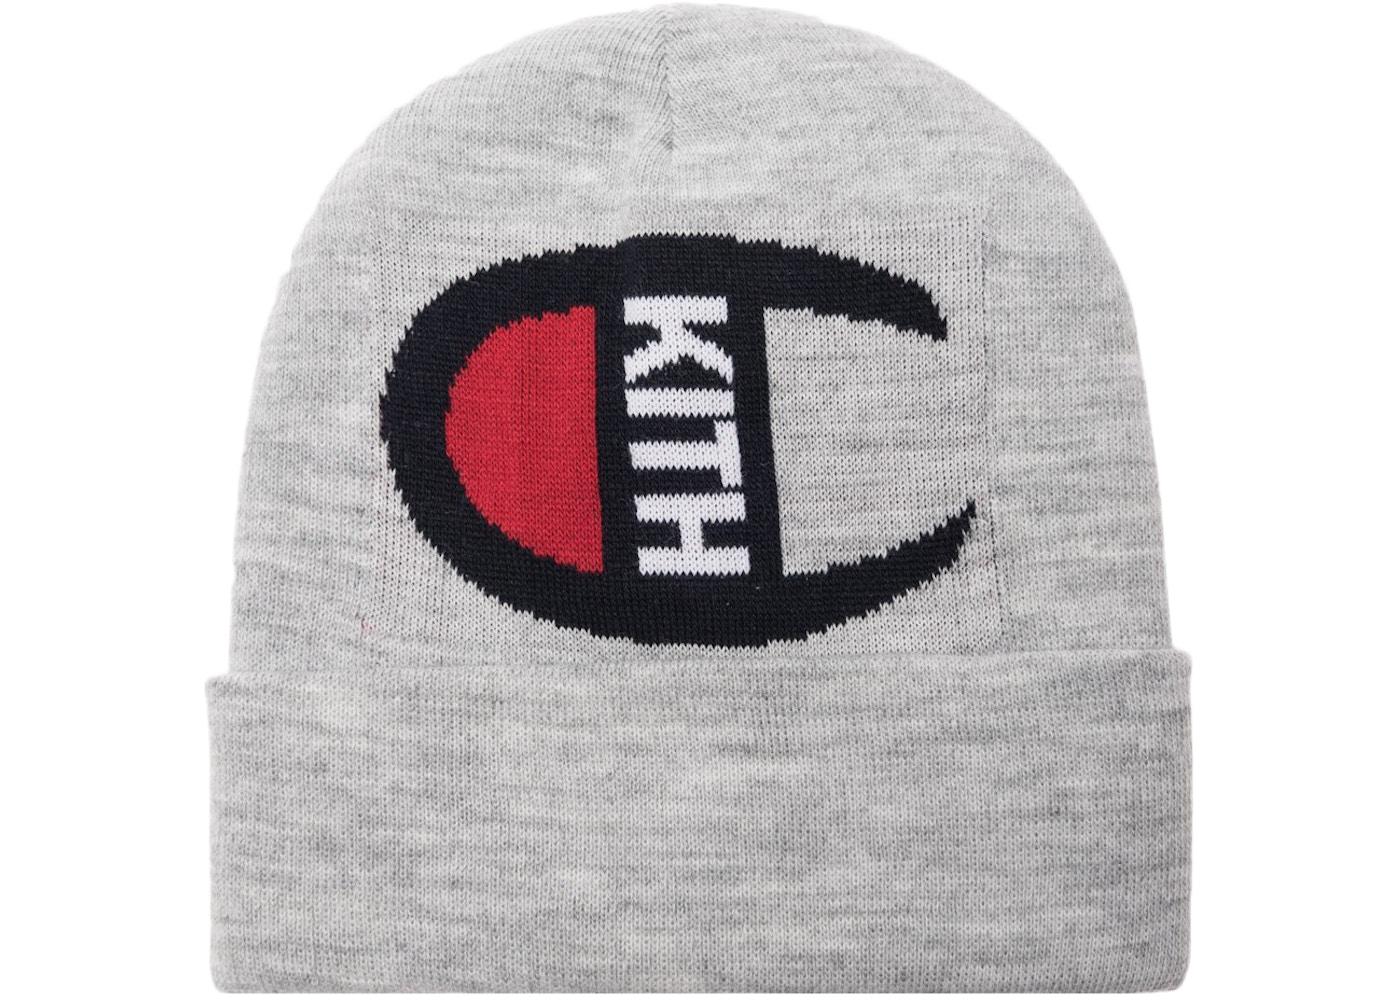 b89fa681cd7dd Sell. or Ask. View All Bids. Kith Champion Intarsia Logo Beanie ...